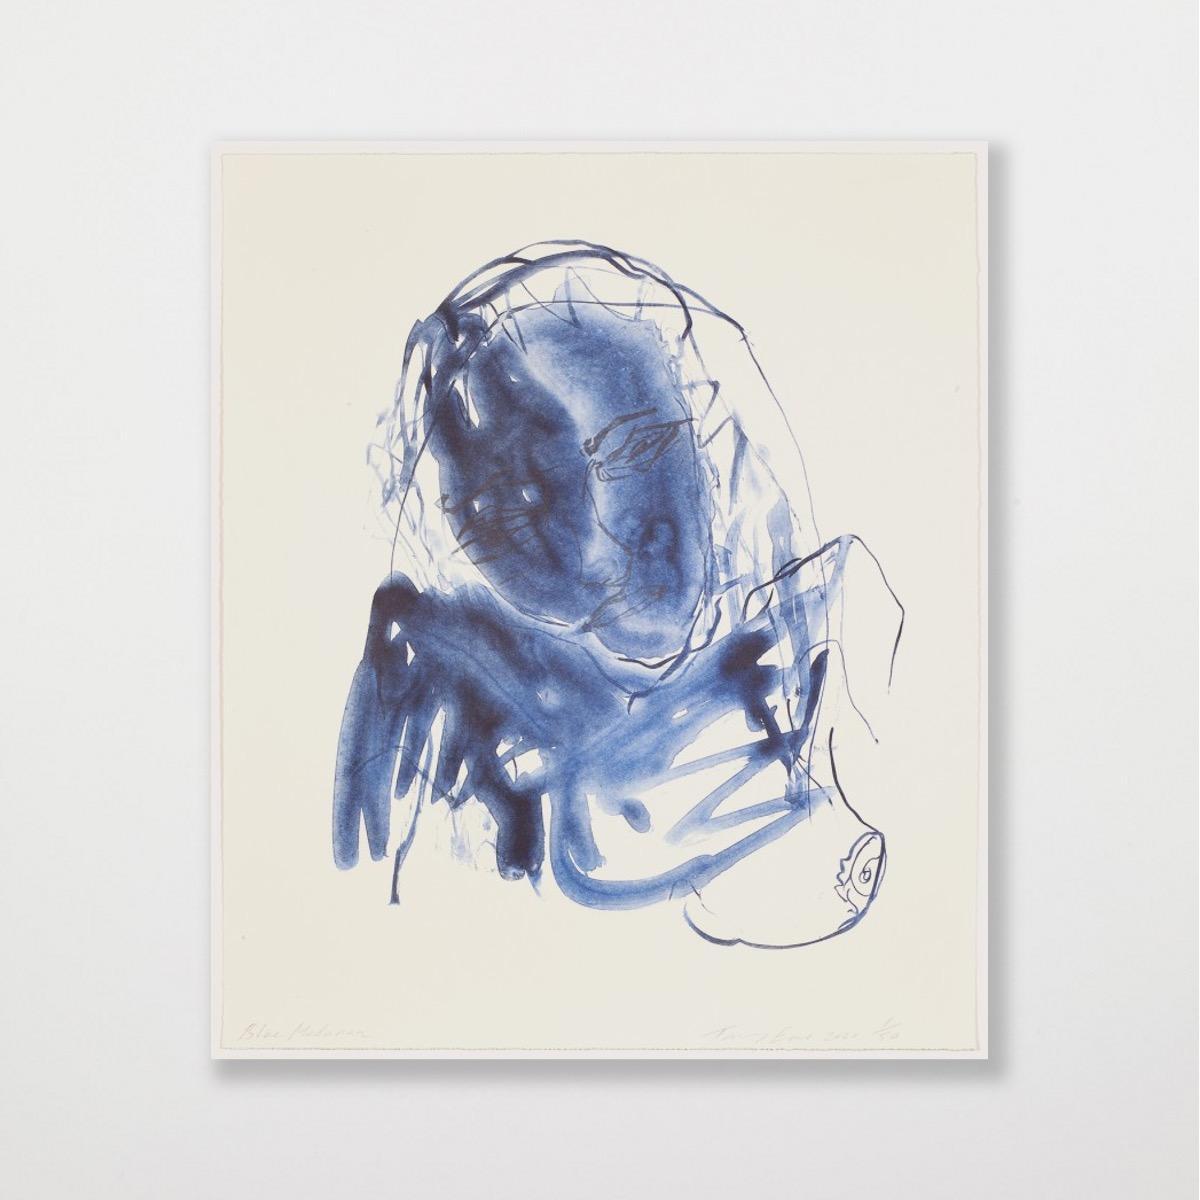 Blue Madonna - Emin, Contemporary, YBAs, Lithograph, Portrait, Black